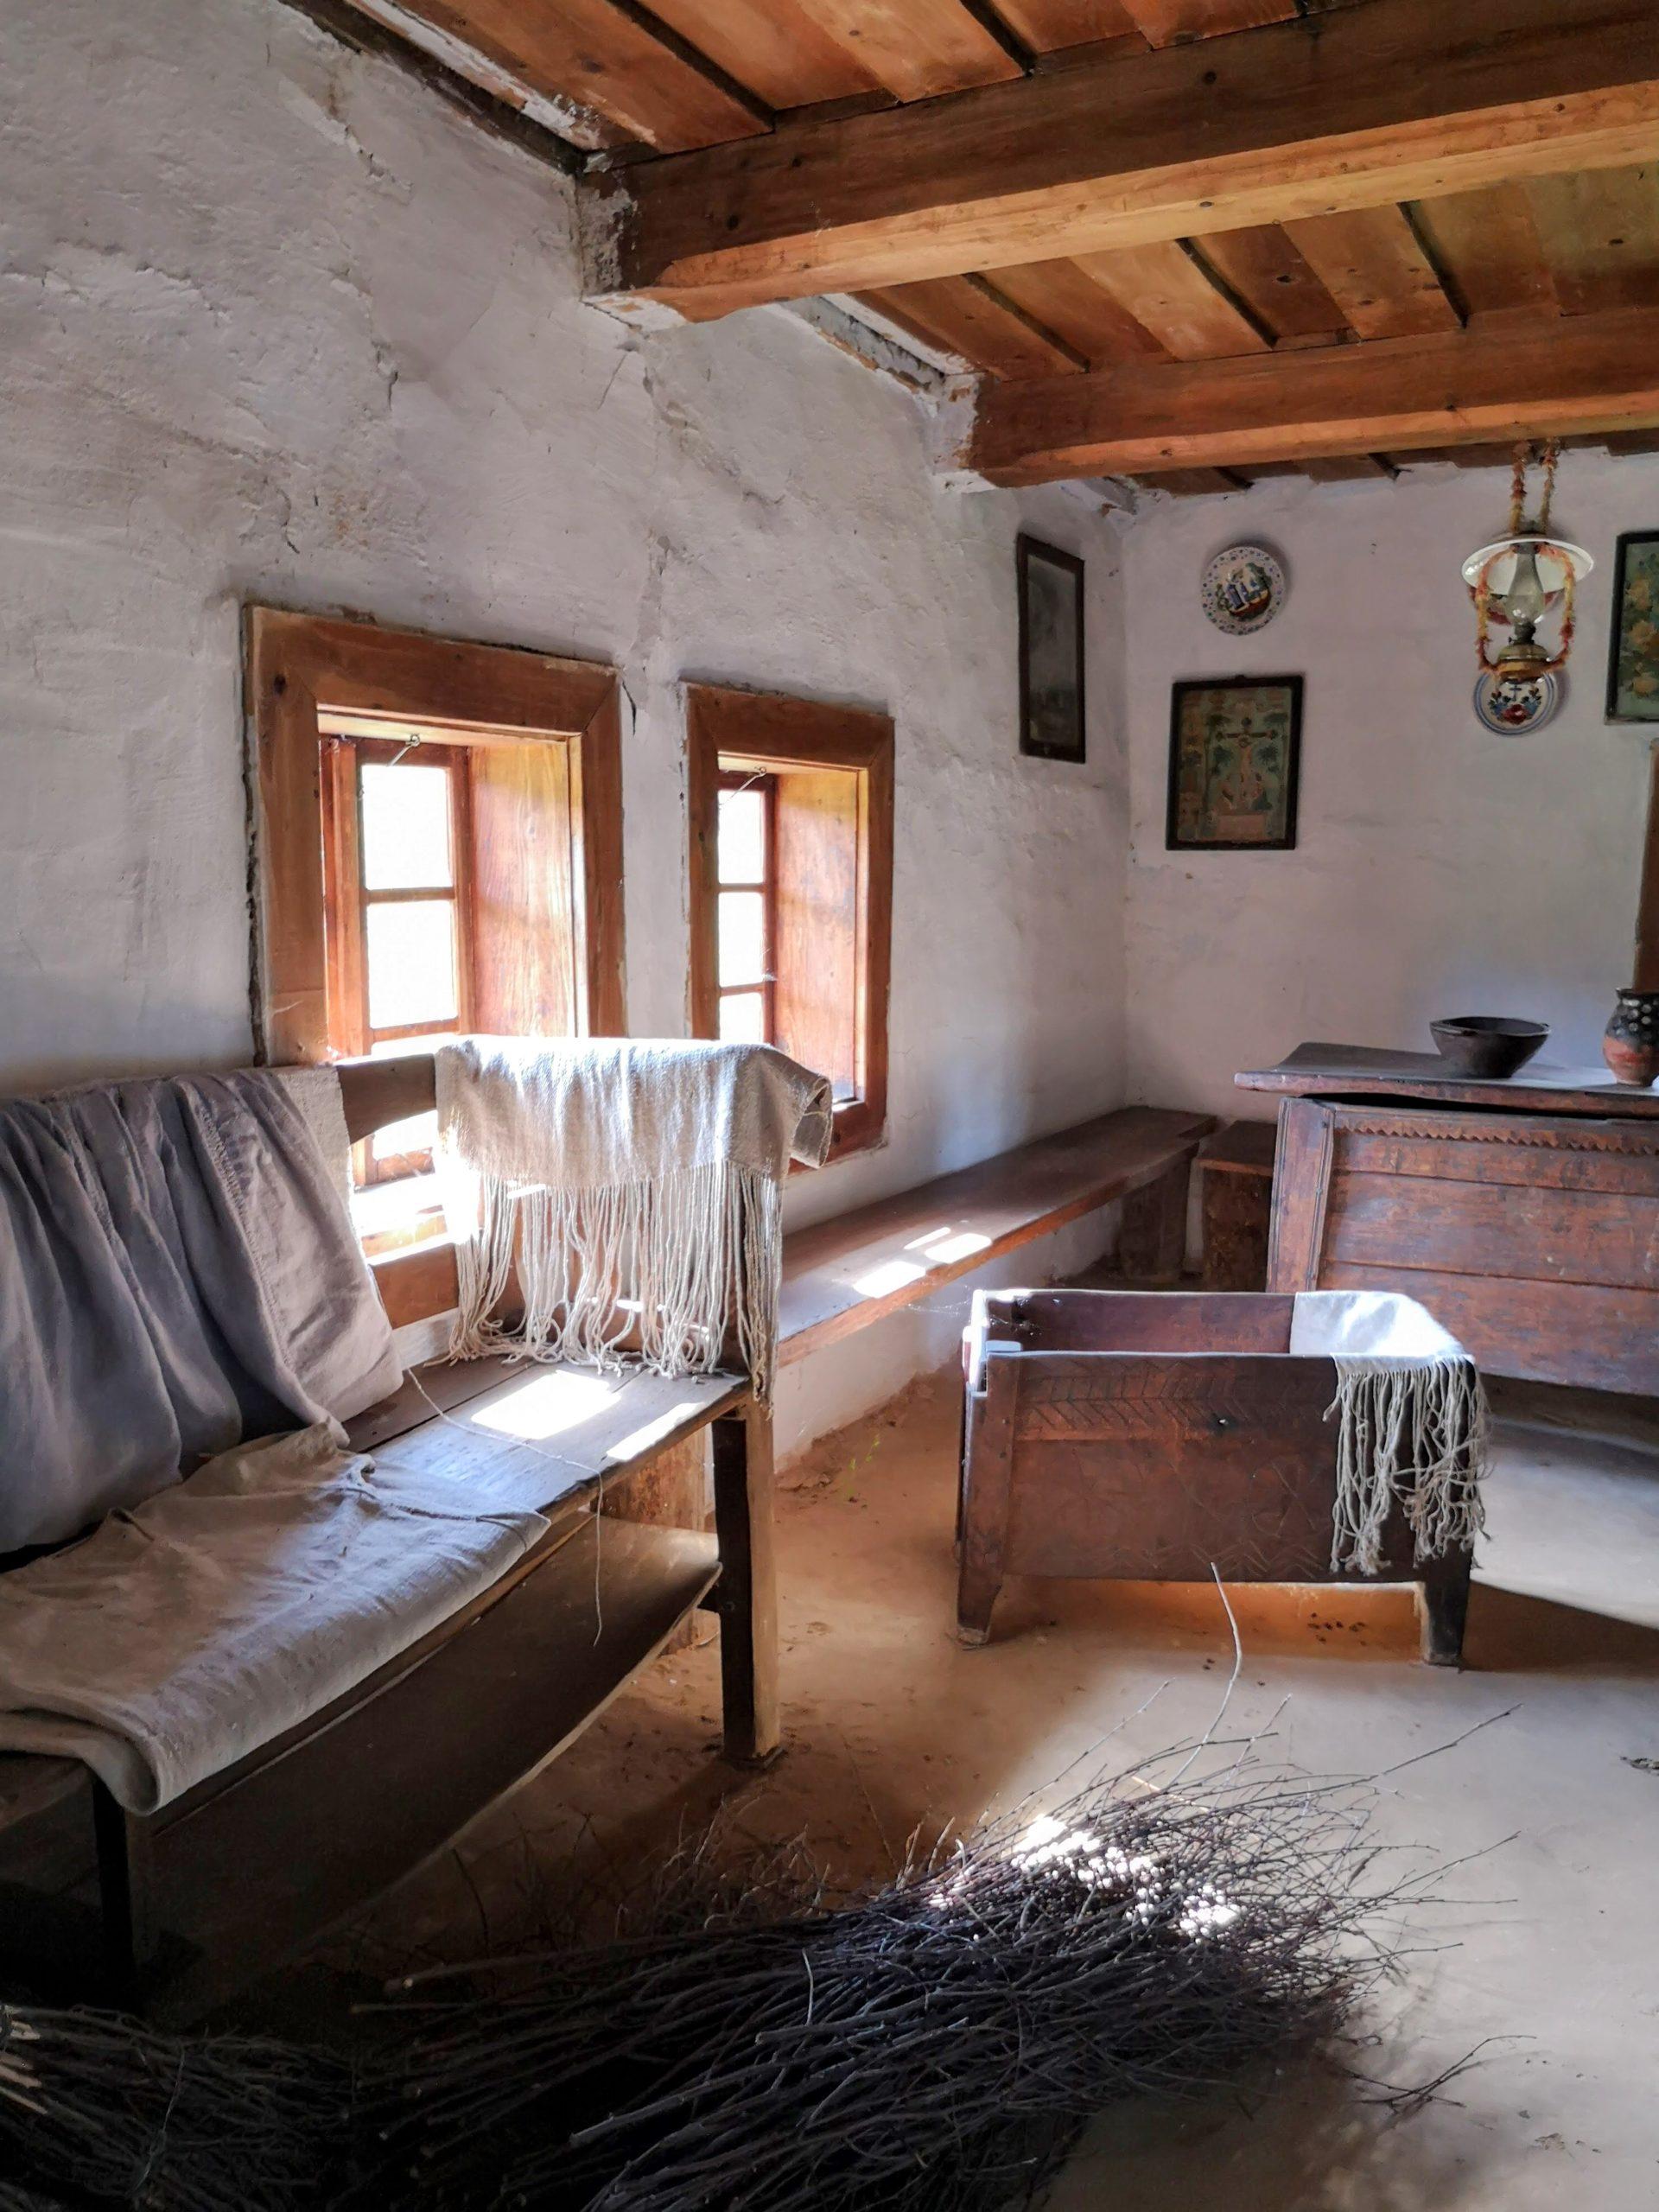 Interér obytného domu